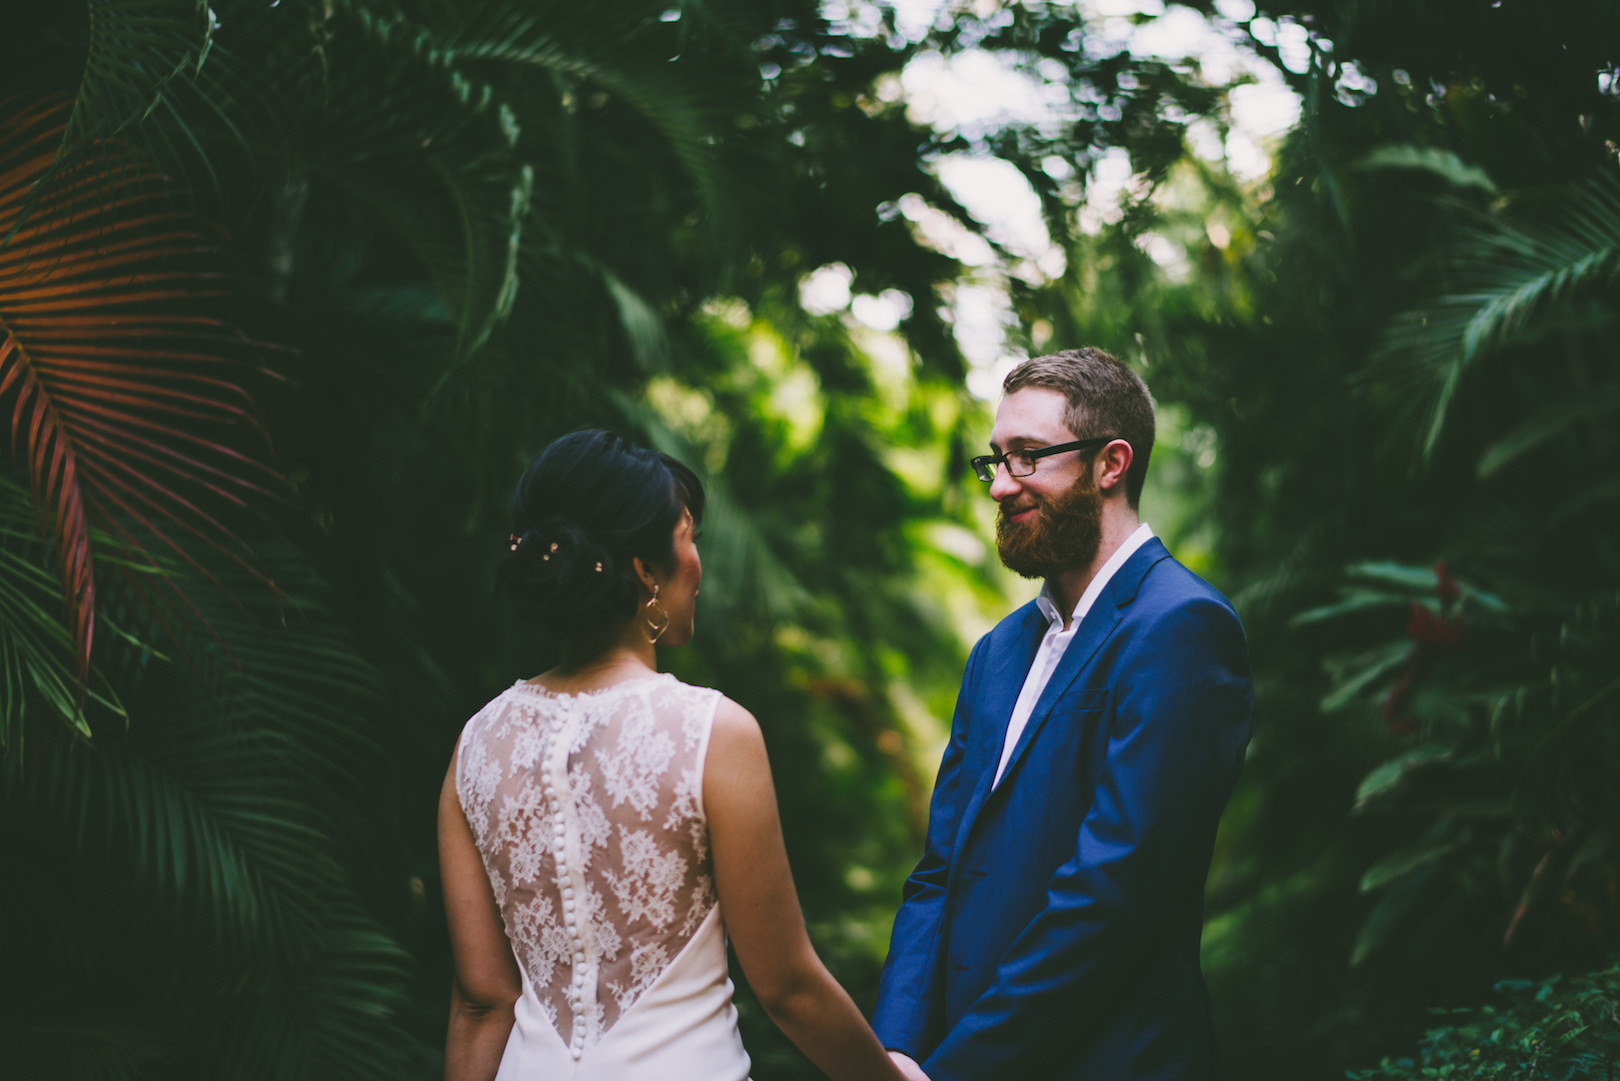 Nathan & Felicia - Wedding Day - © Dallas Kolotylo Photography - 295